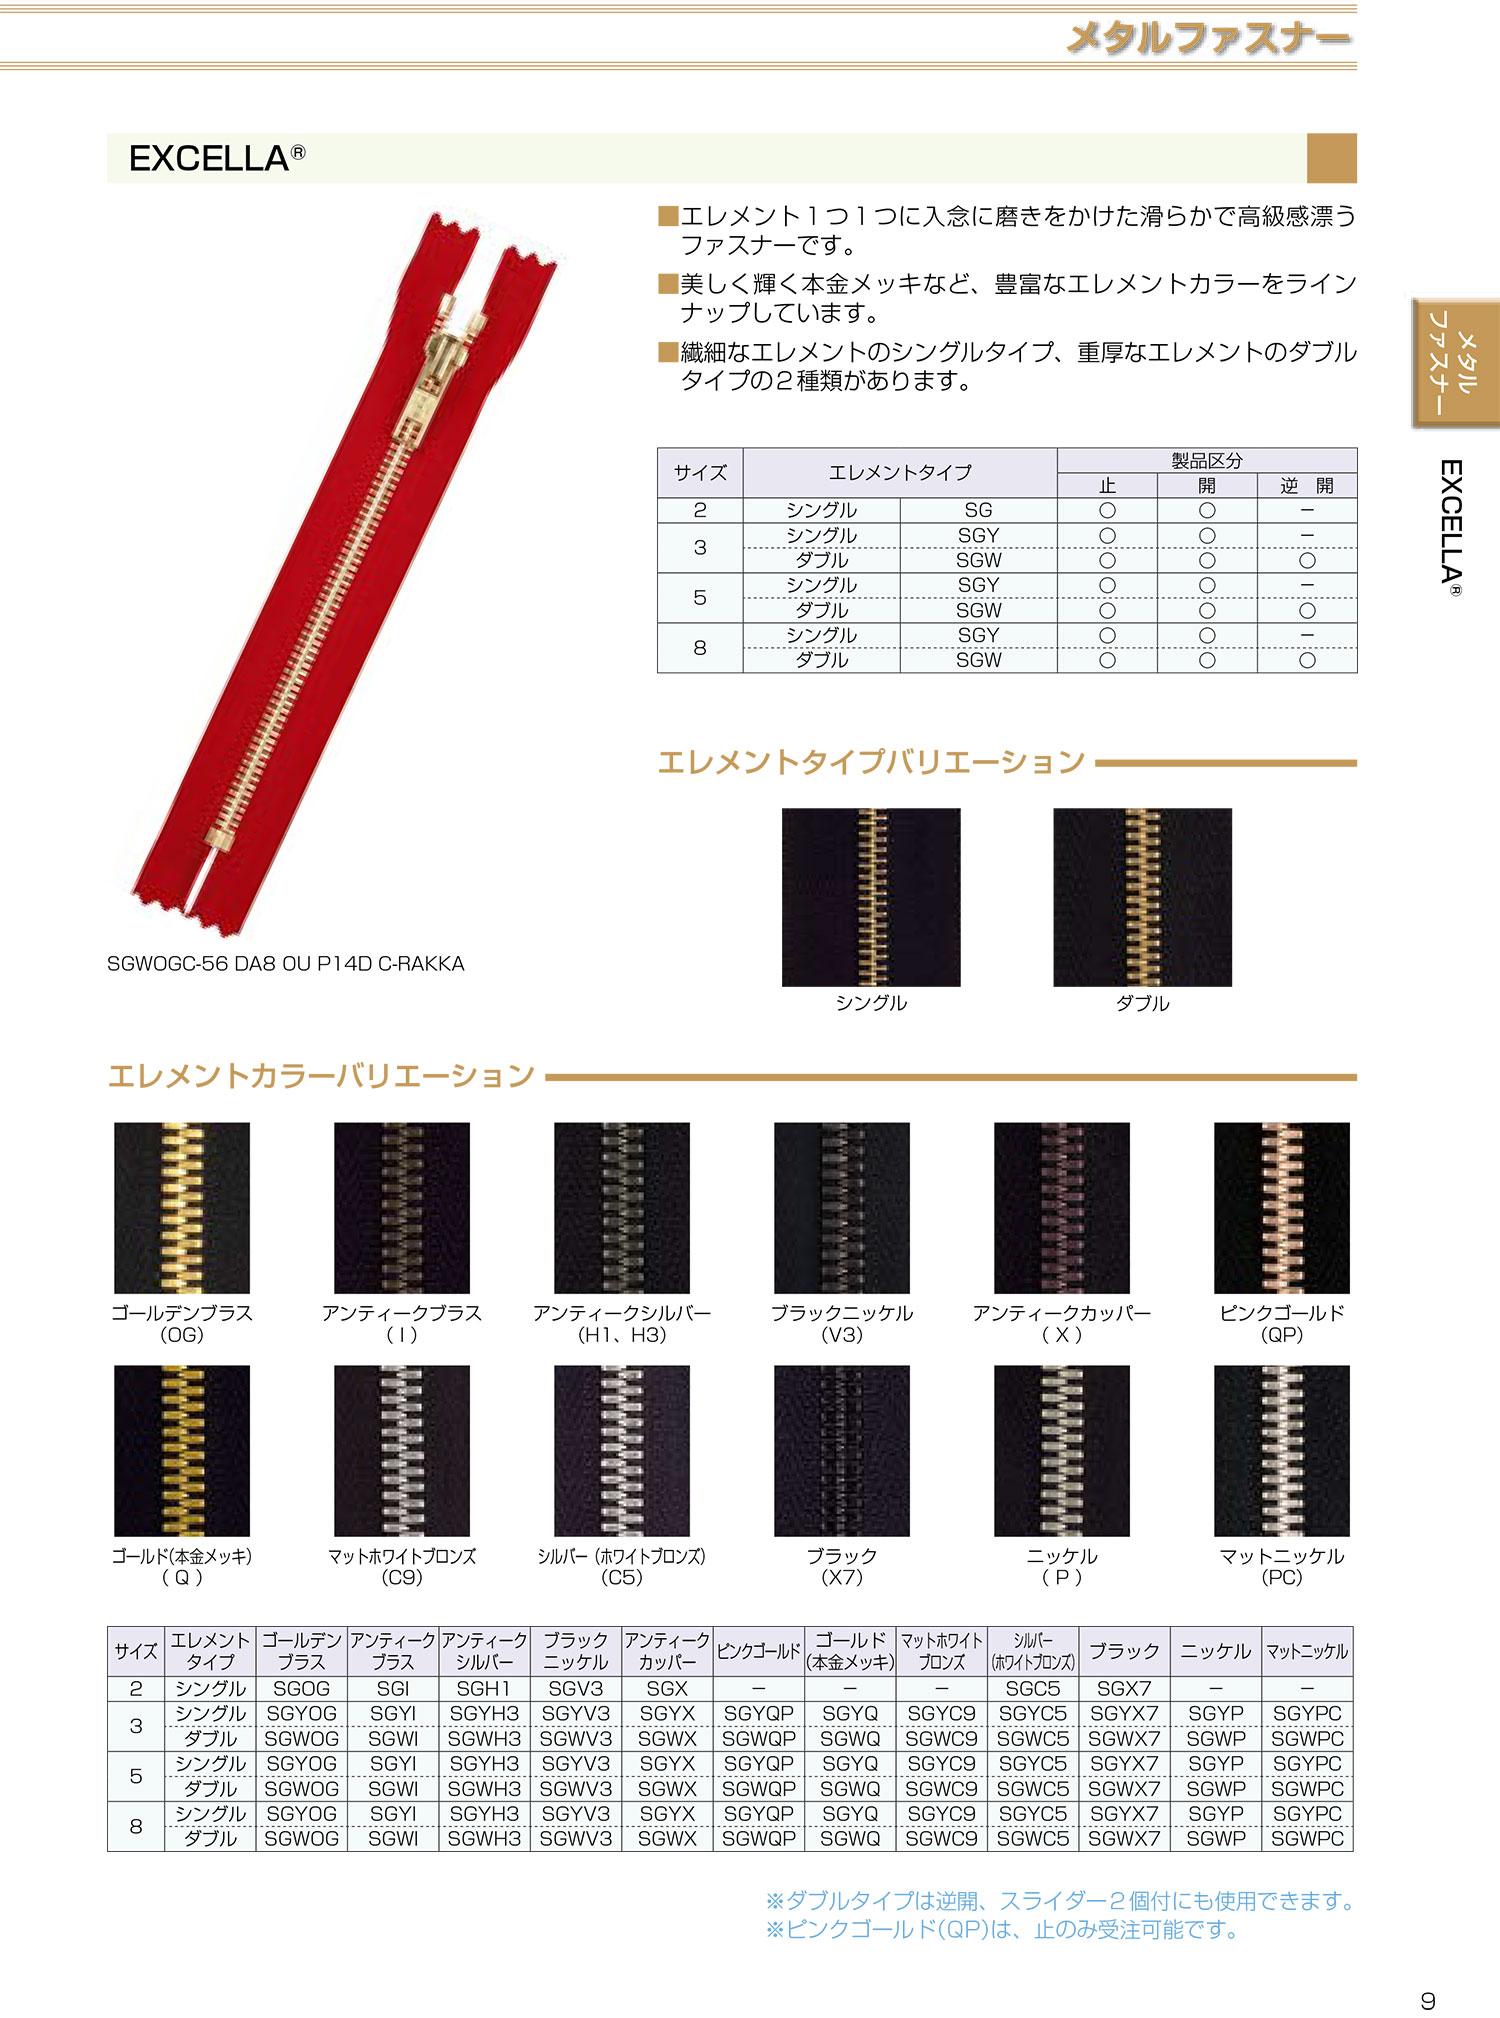 8SGYC9OR エクセラ 8サイズ マットホワイトブロンズ オープン シングル[ファスナー] YKK/オークラ商事 - ApparelX アパレル資材卸通販